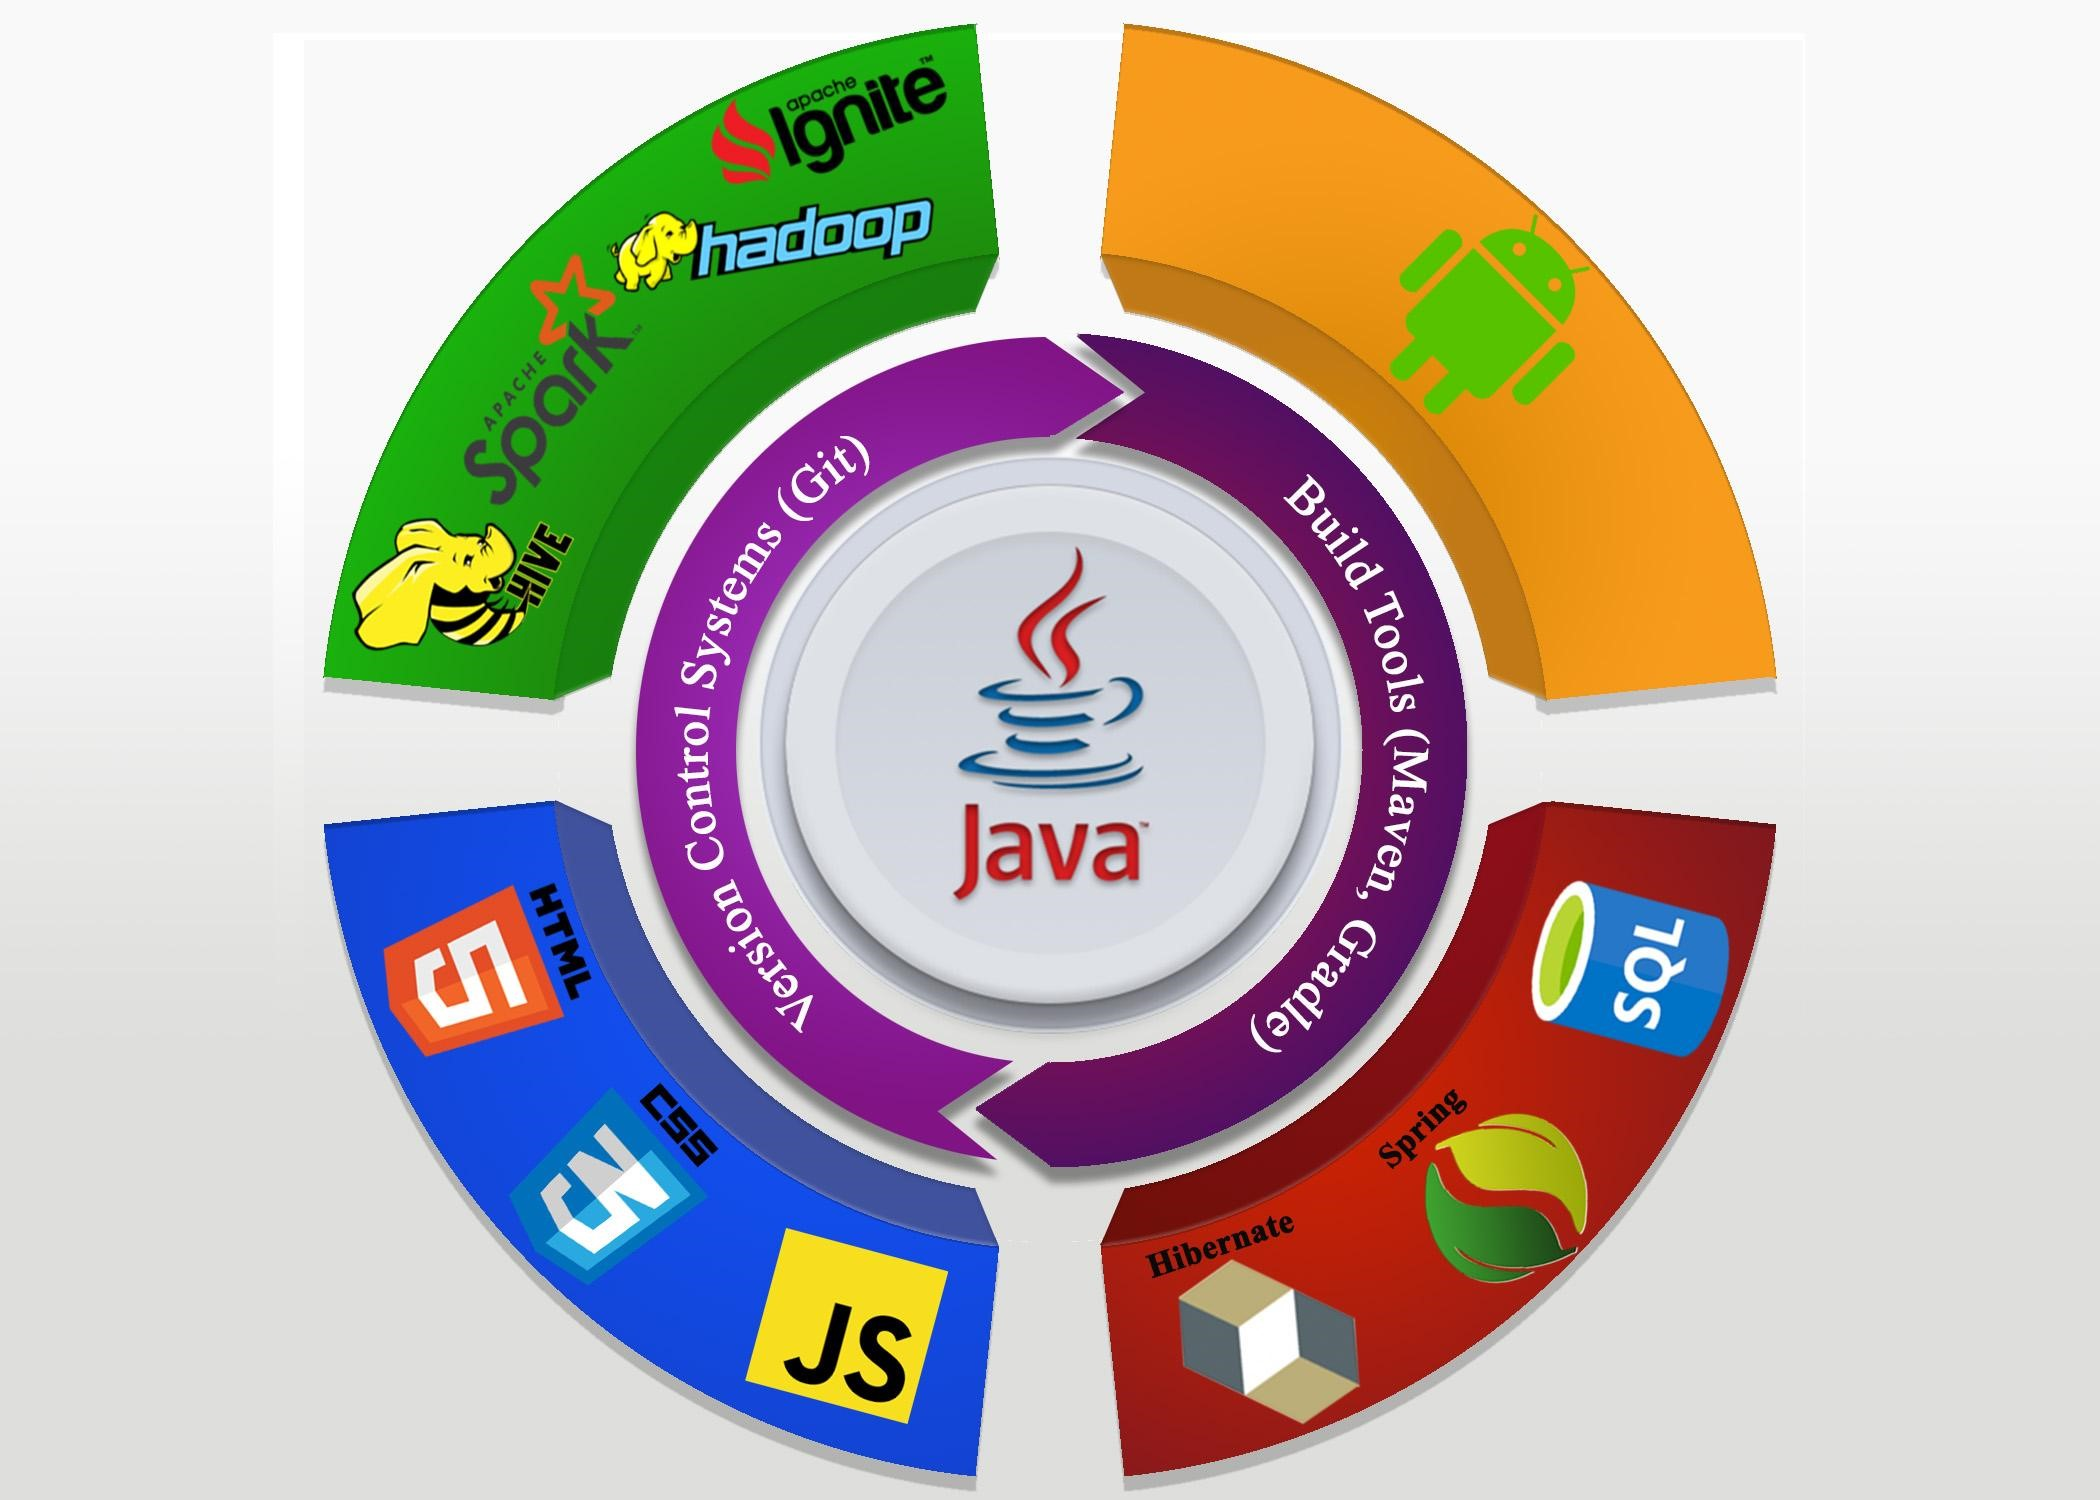 технологии Java